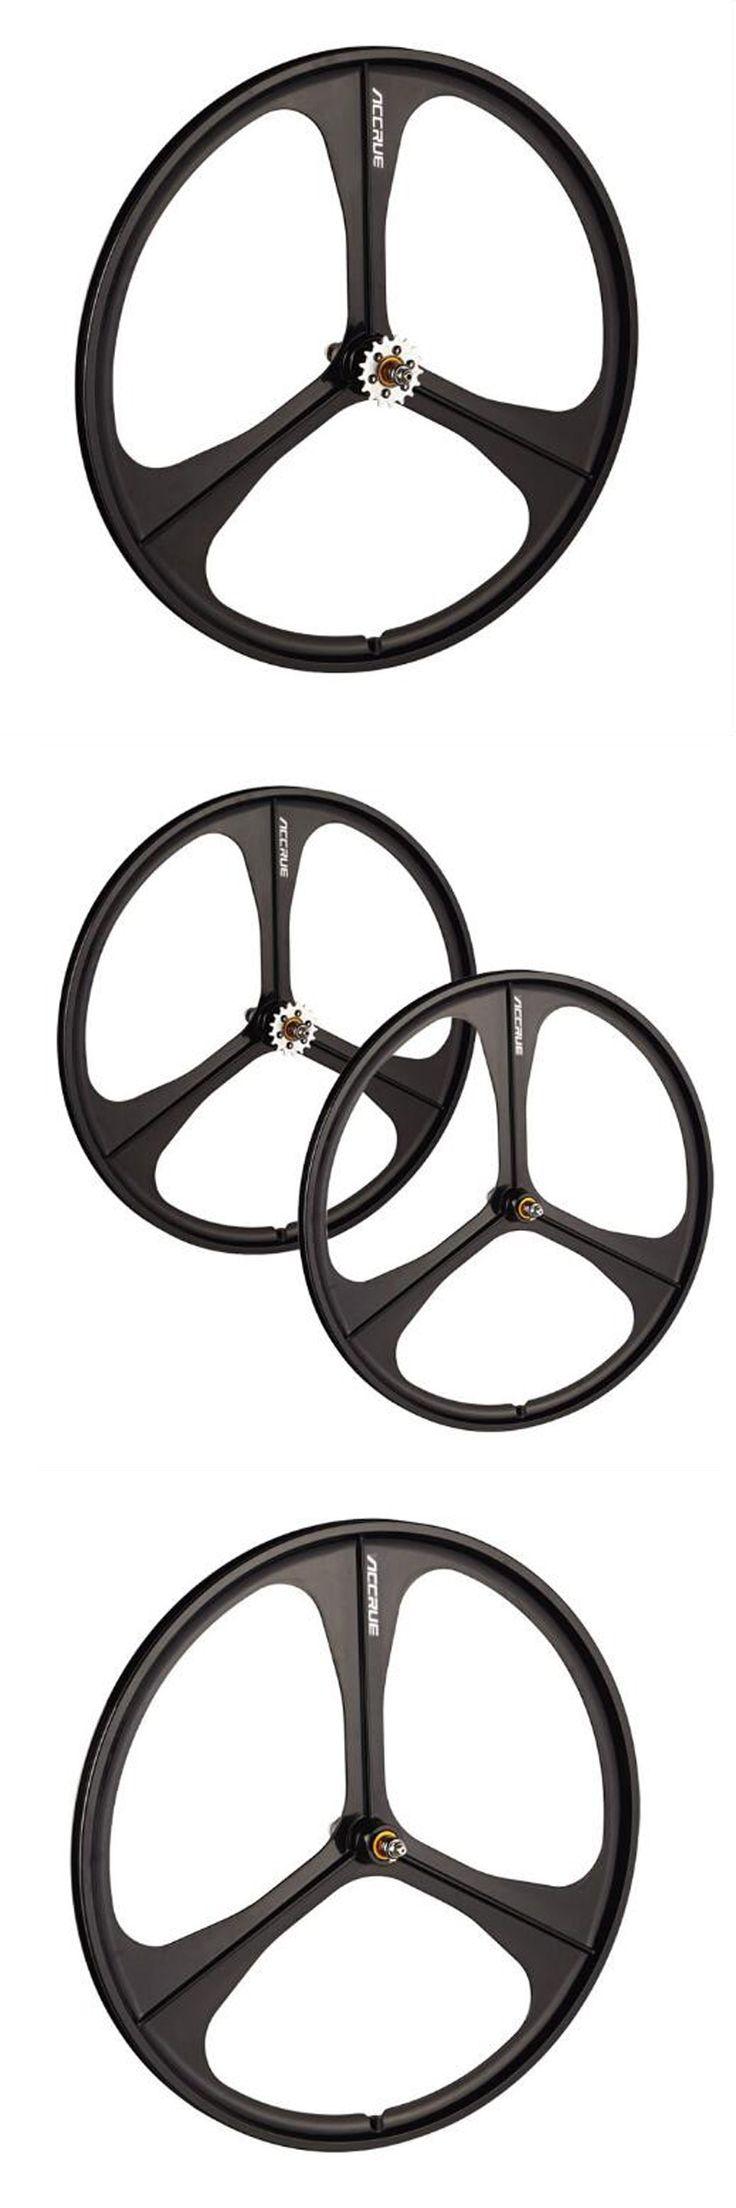 Magnesium Alloy Wheel 3 Pokes Fixie Bicycle Front wheel  Fixed Gear Bike Wheels Rims 700C  Wheel